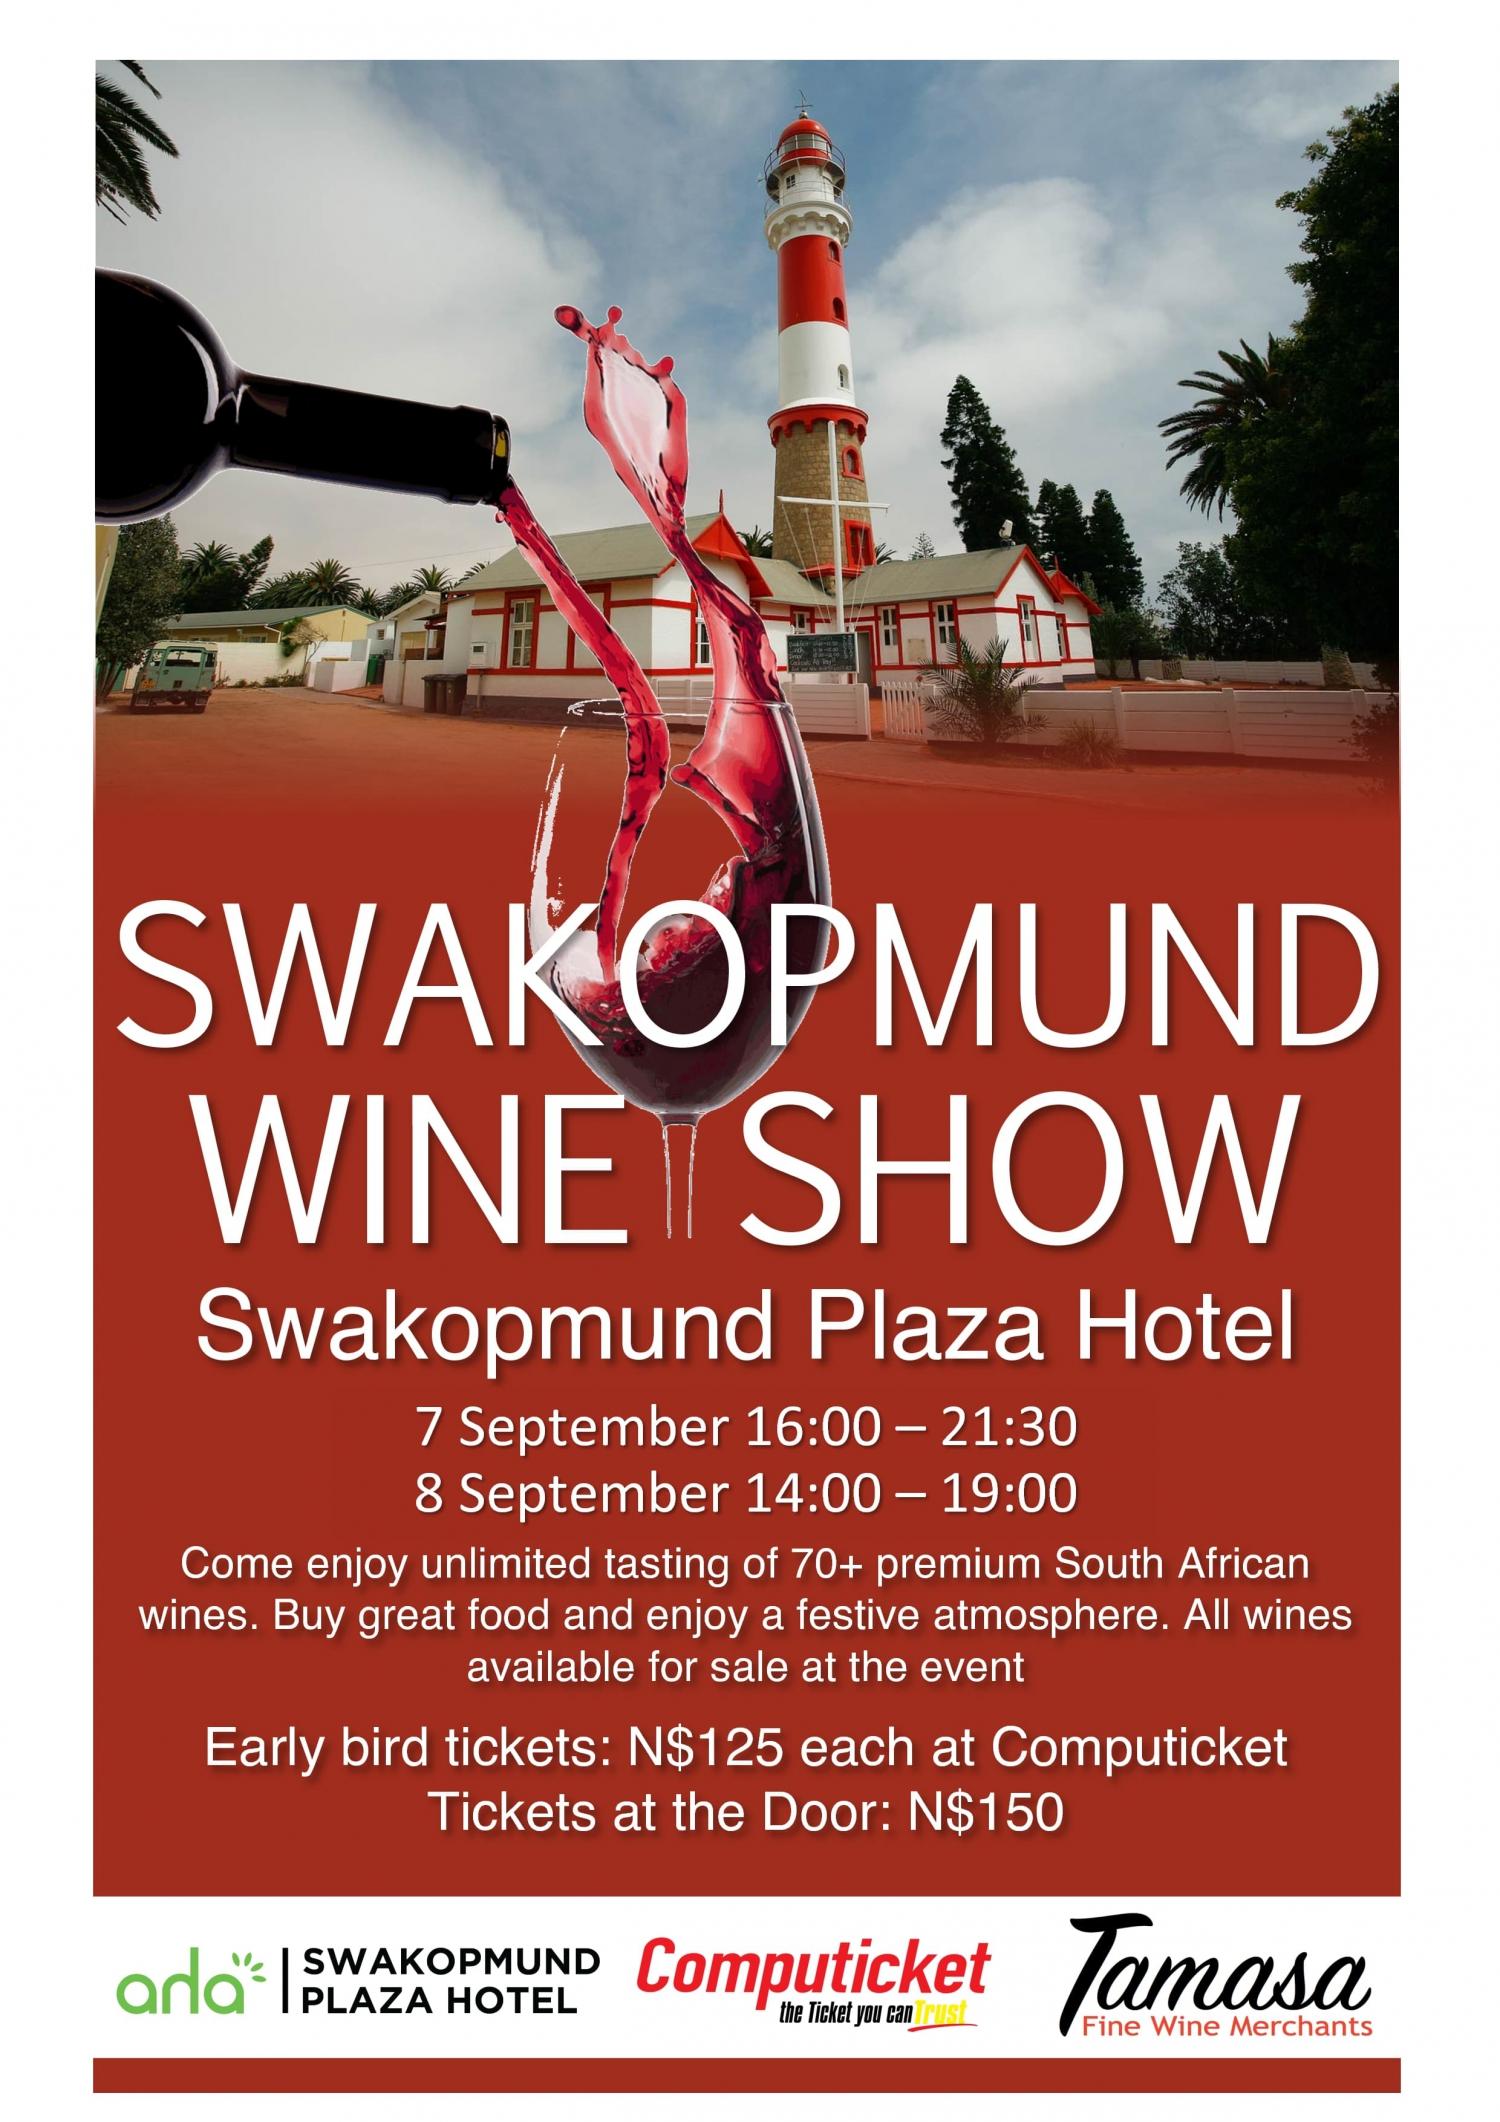 Swakopmund Wine Show